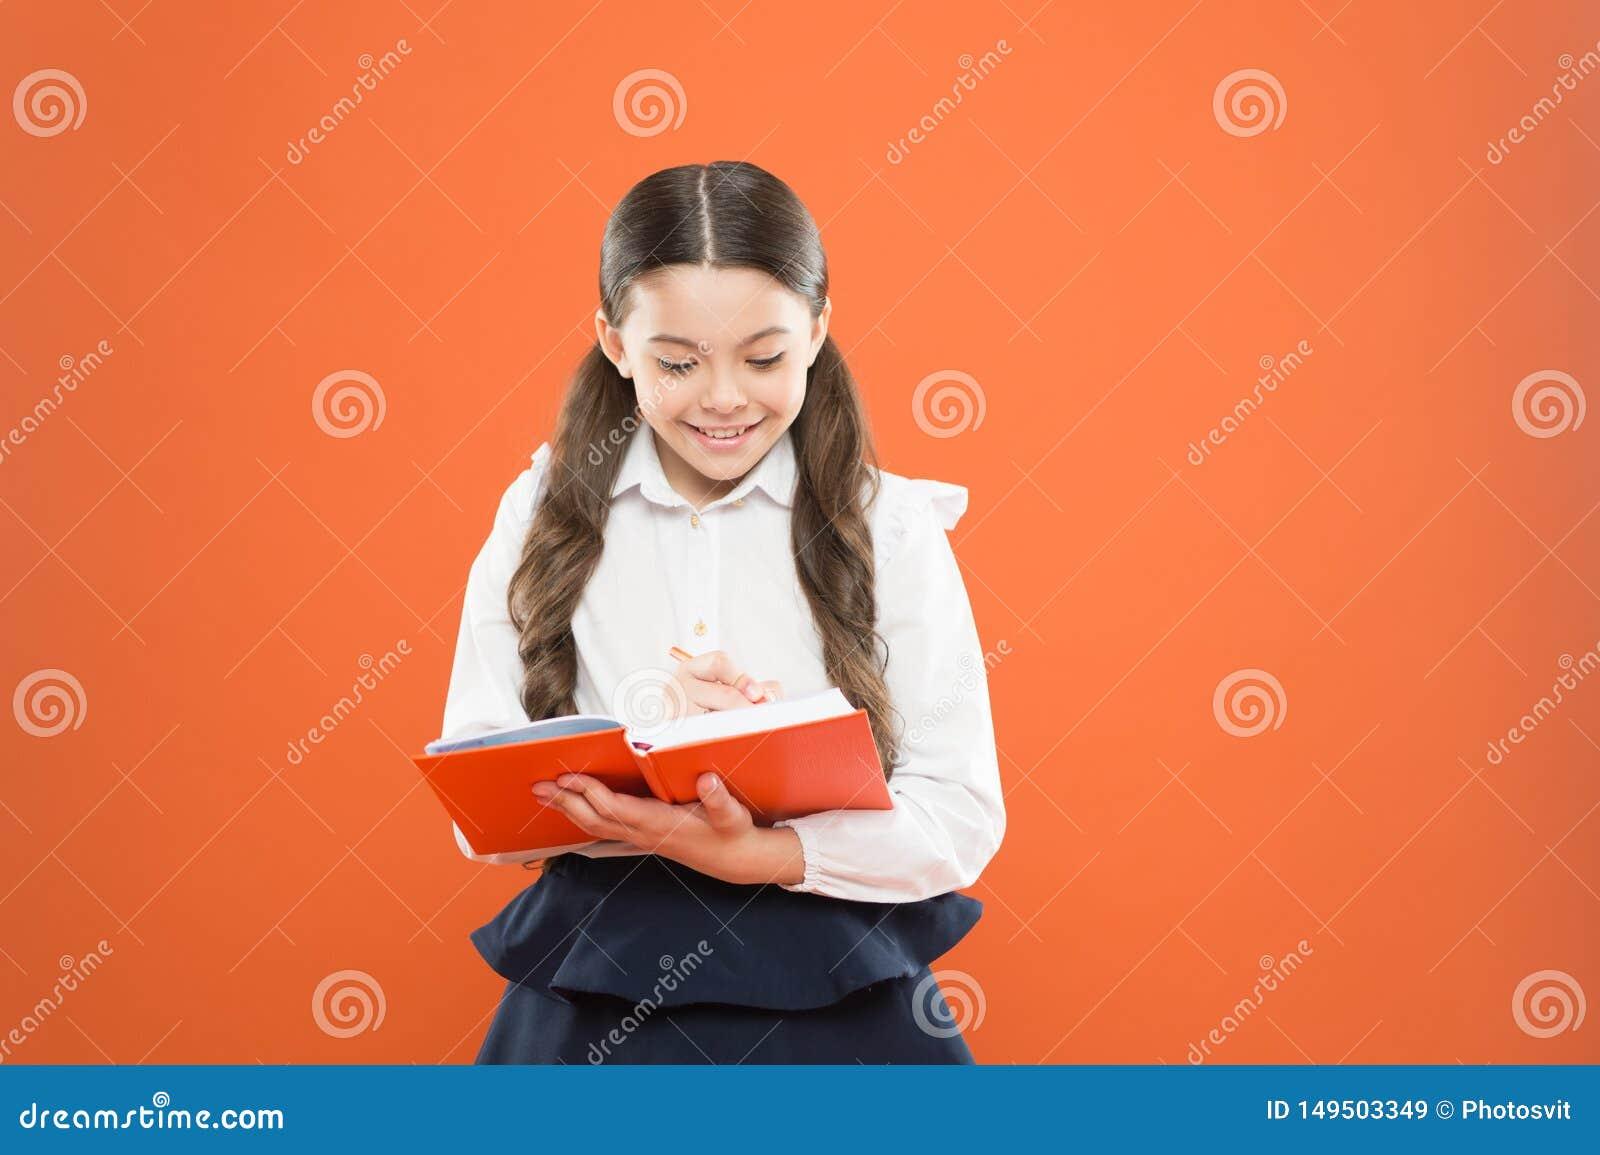 Schoolgirl enjoy study. Kid school uniform hold workbook. School lesson. Child doing homework. Your career path begins